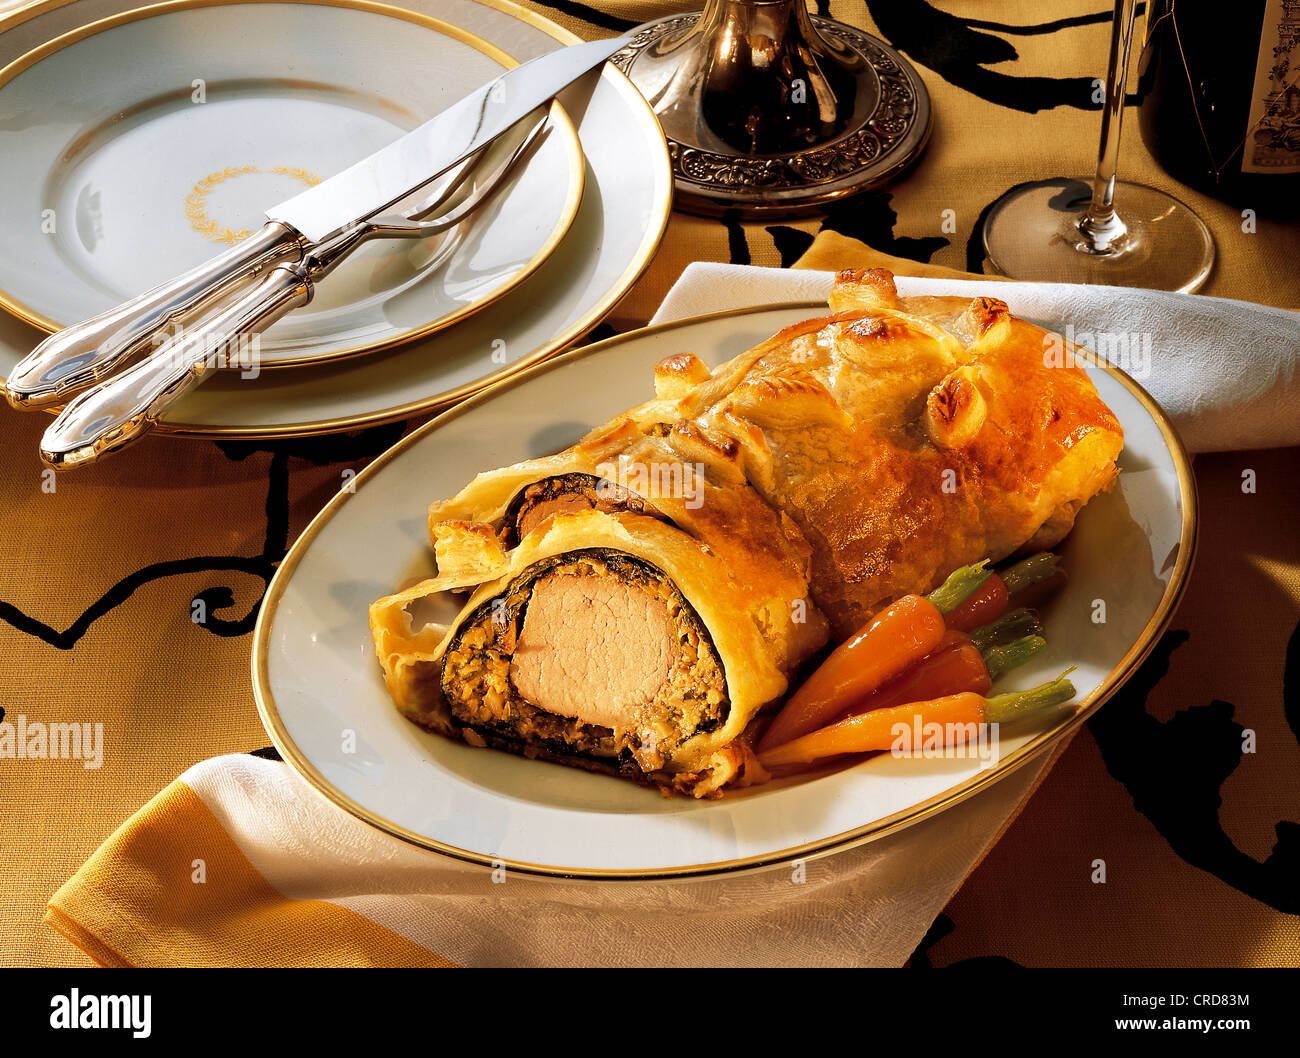 Pork loin in puff pastry recipe